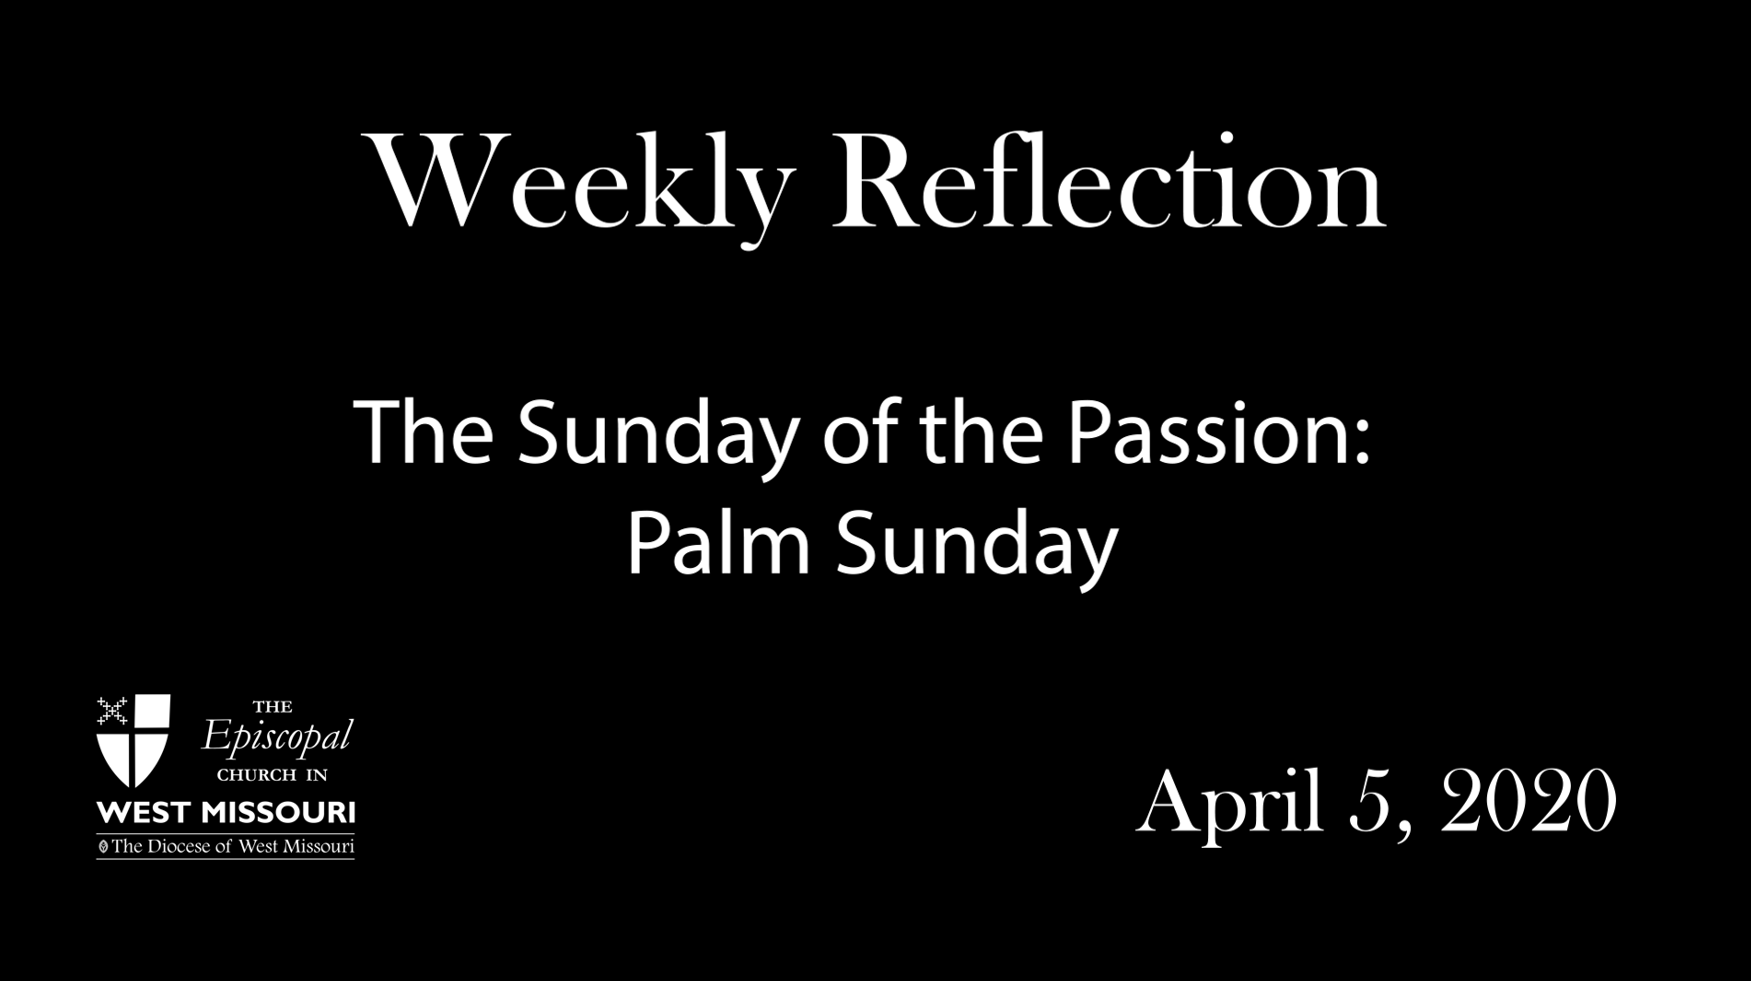 Weekly Reflection – Sunday of the Passion: Palm Sunday